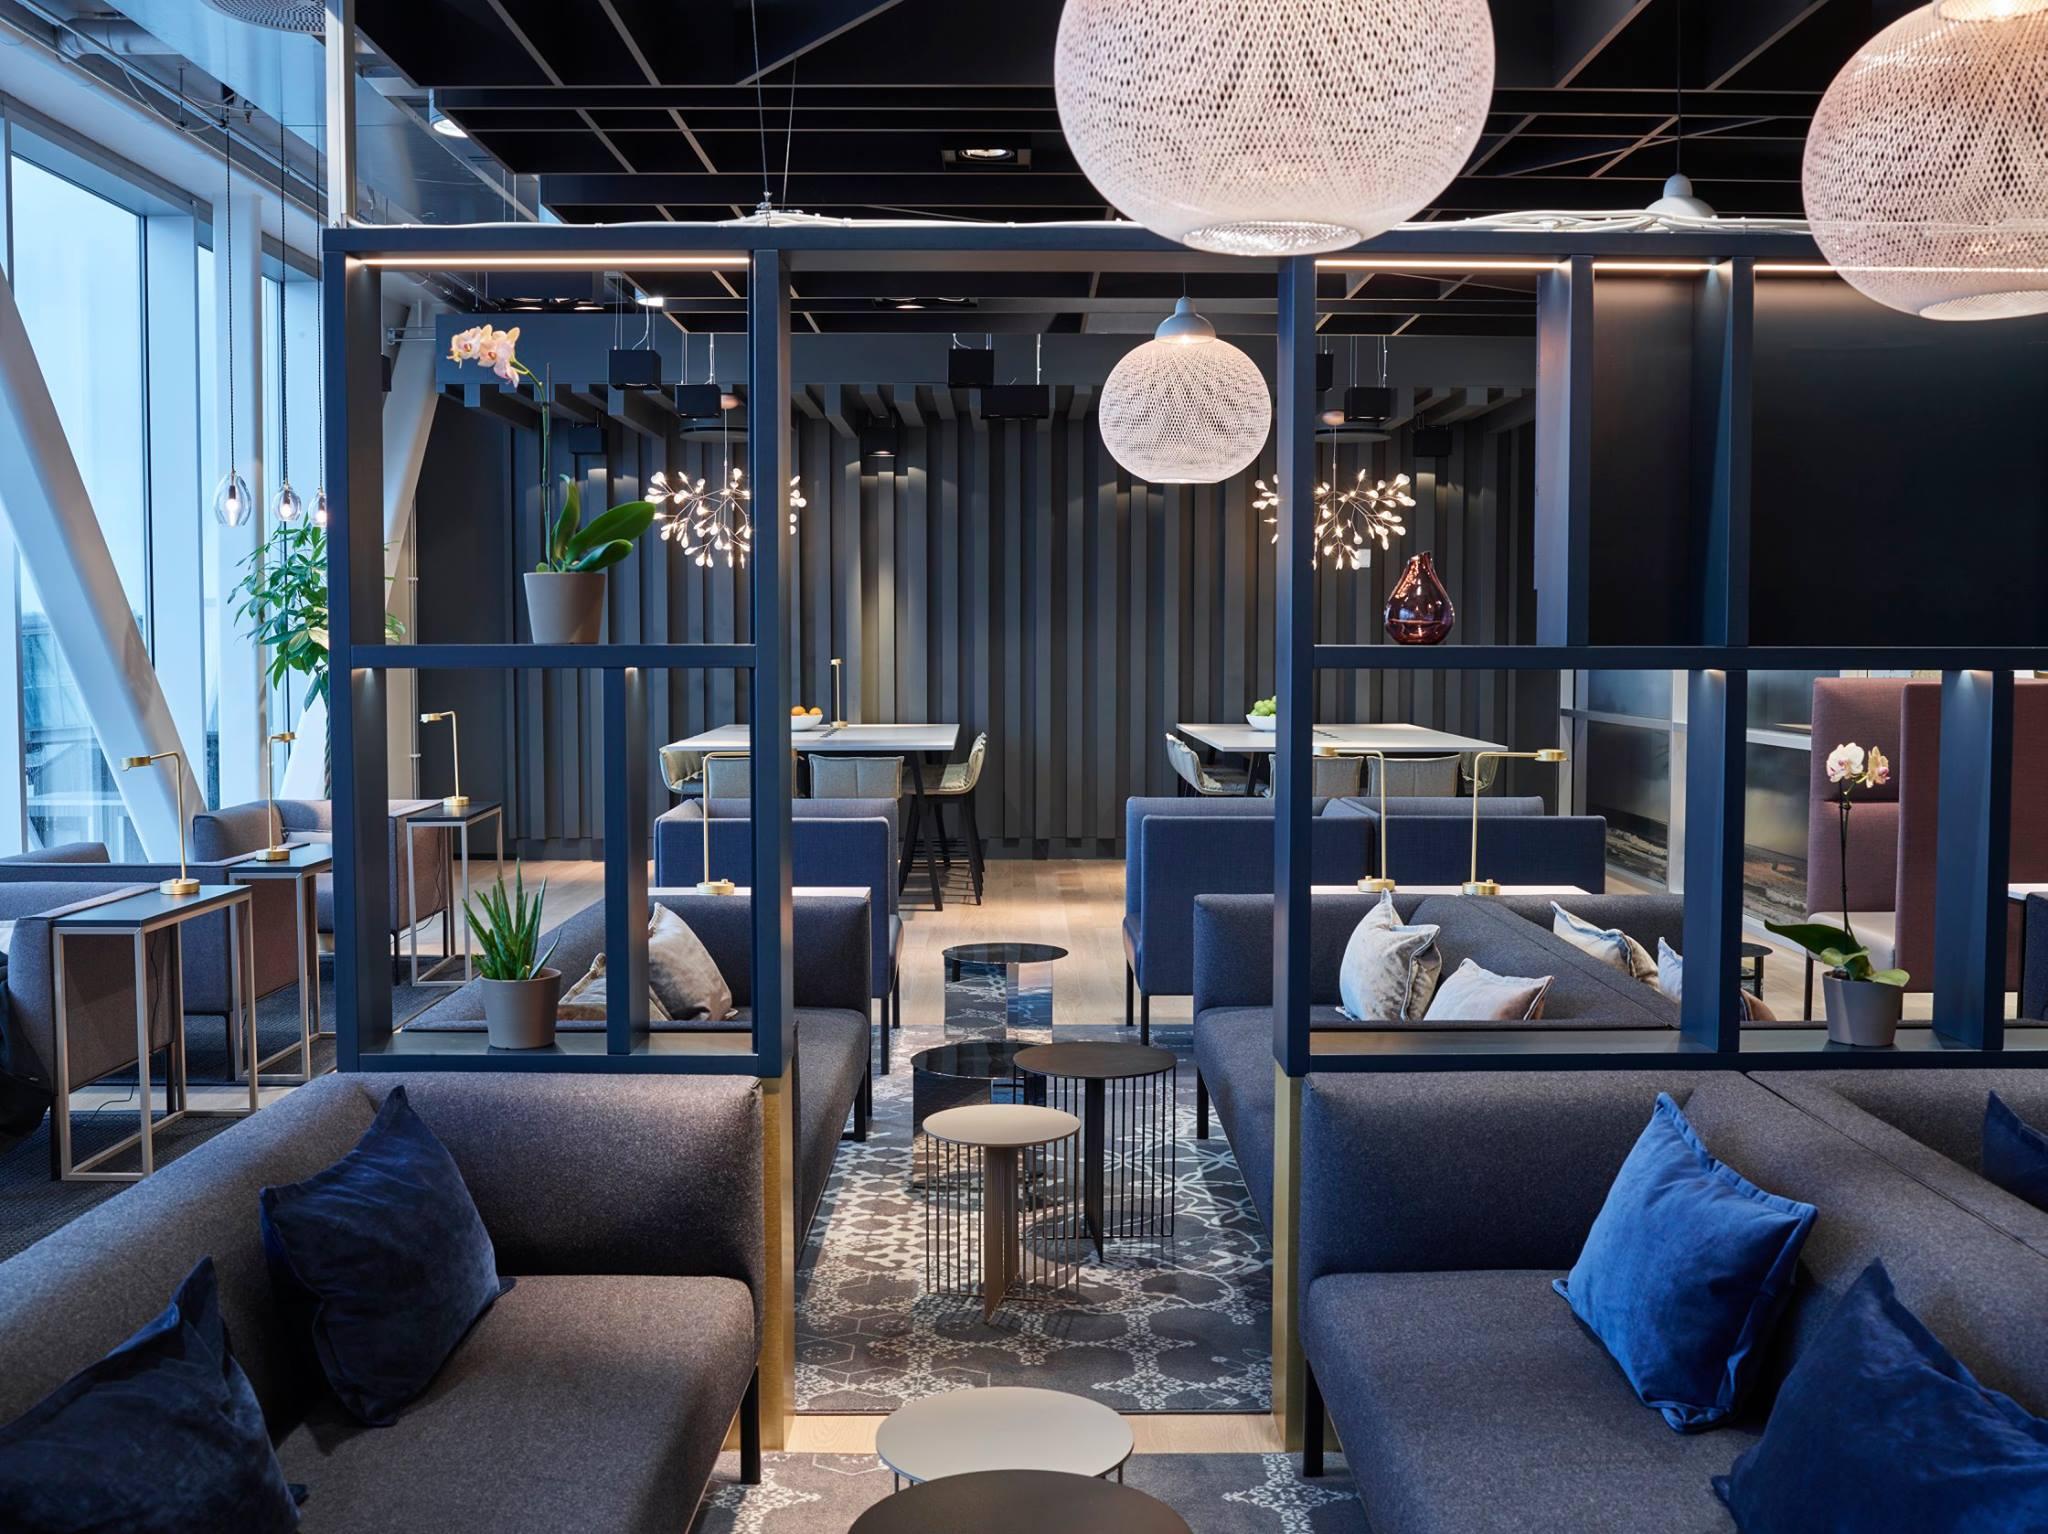 Business+Lounge+Stavanger+Lufthavn+003.jpg